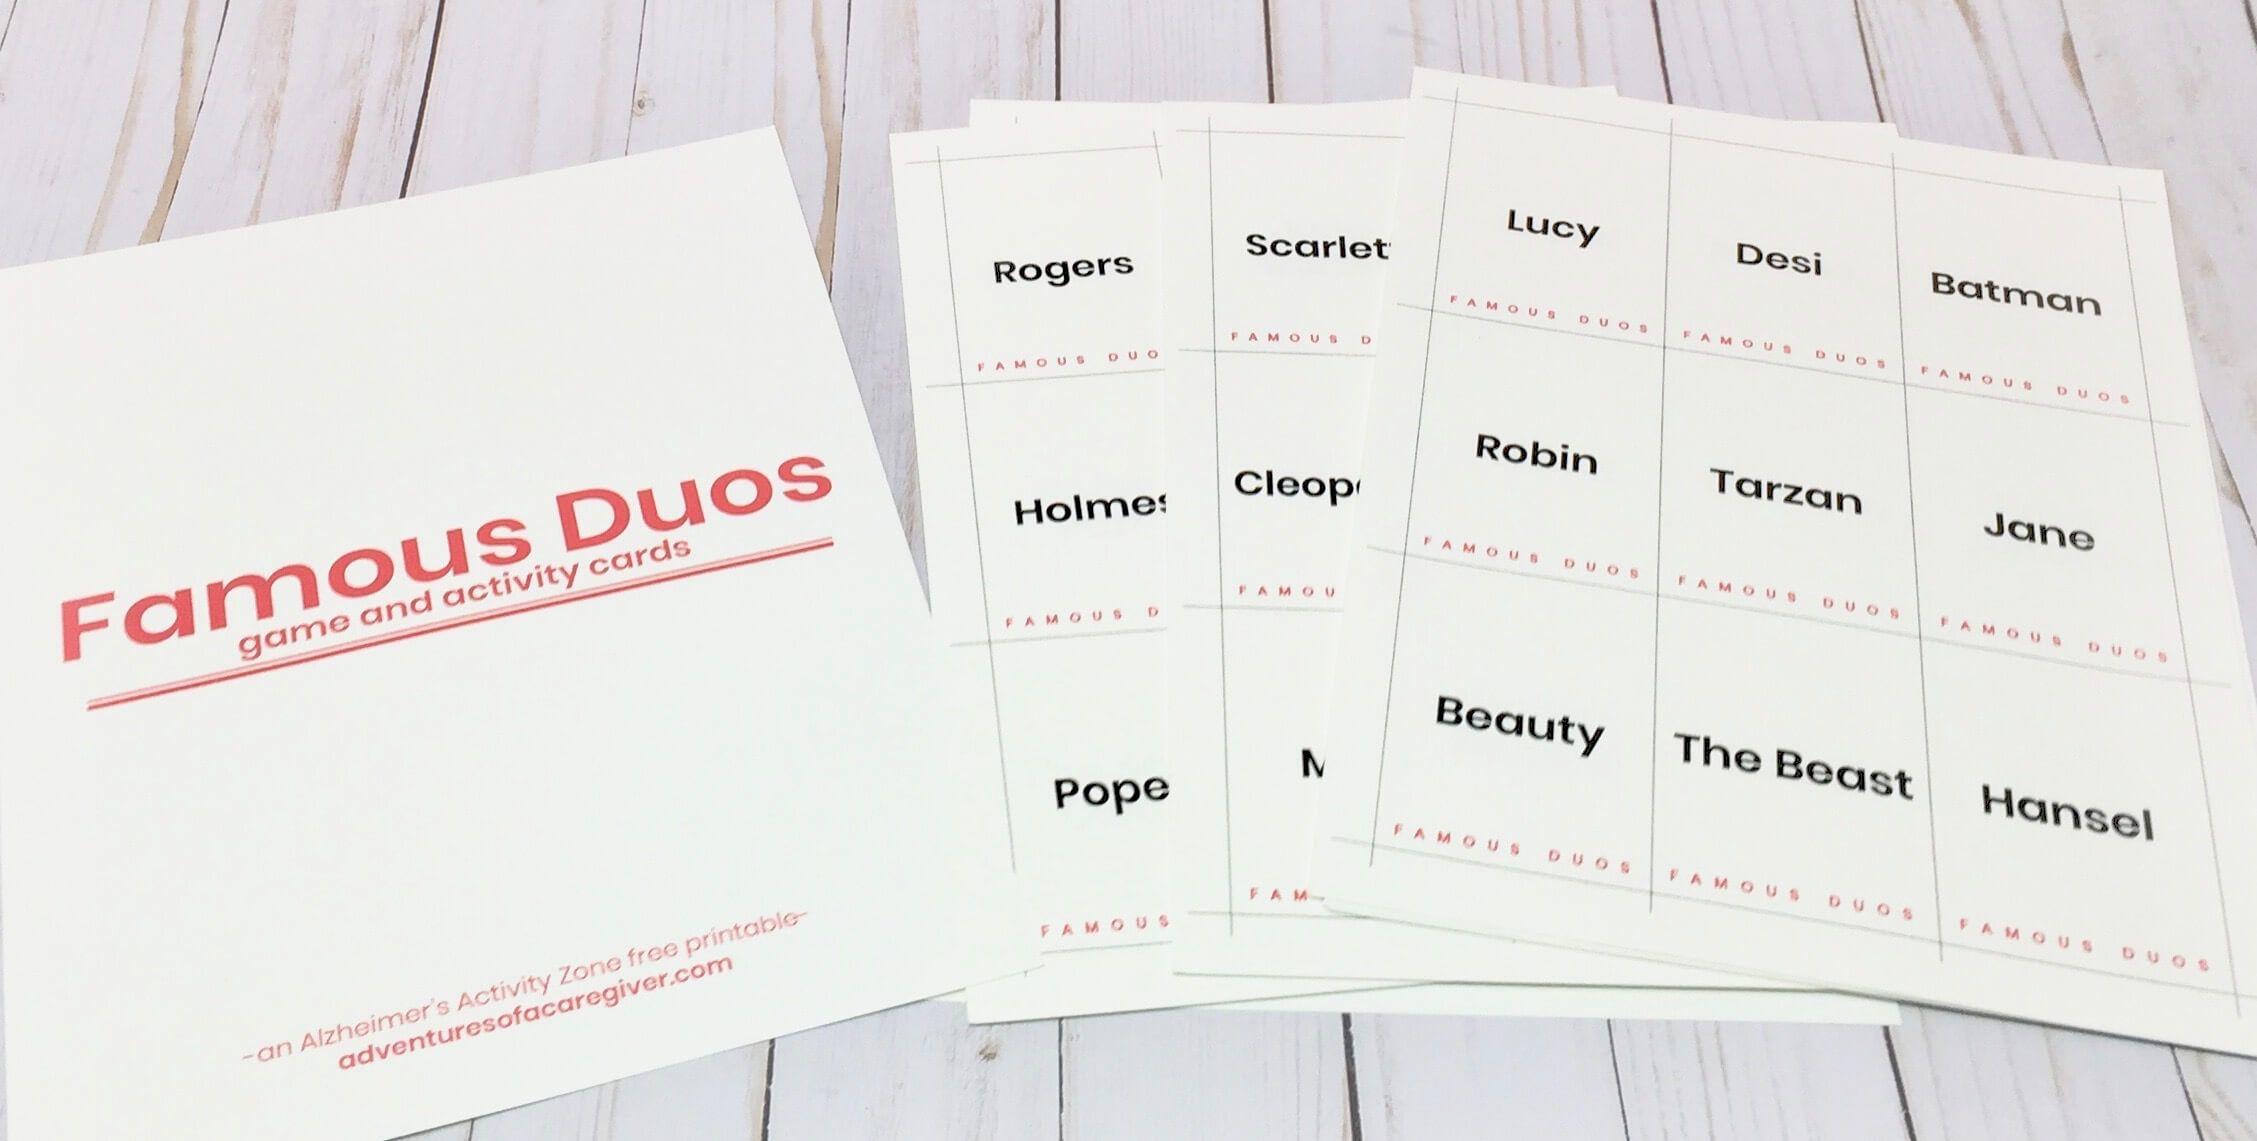 Famous Duos Free Printable